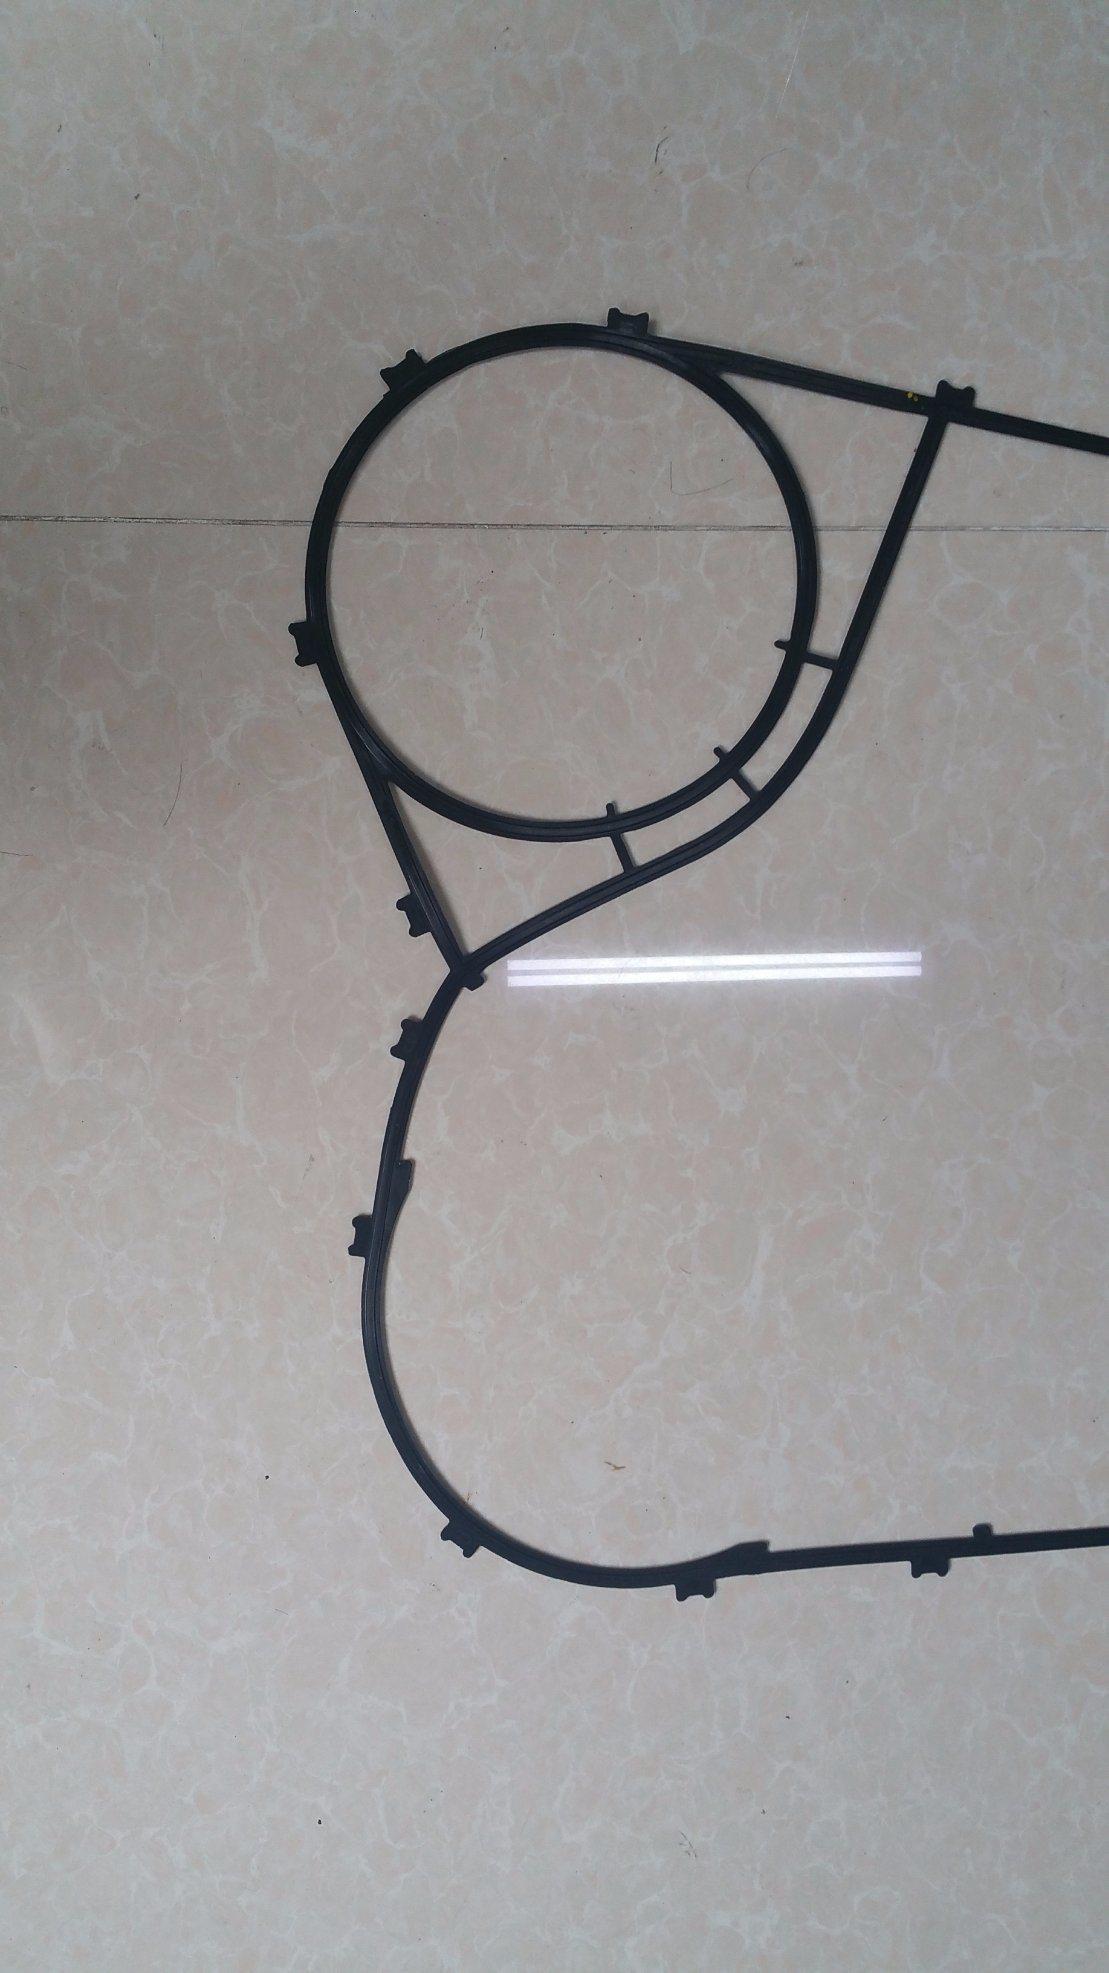 Hisaka Plate Heat Exchanger Ux30 Sx41 Heat Exchanger Gasket